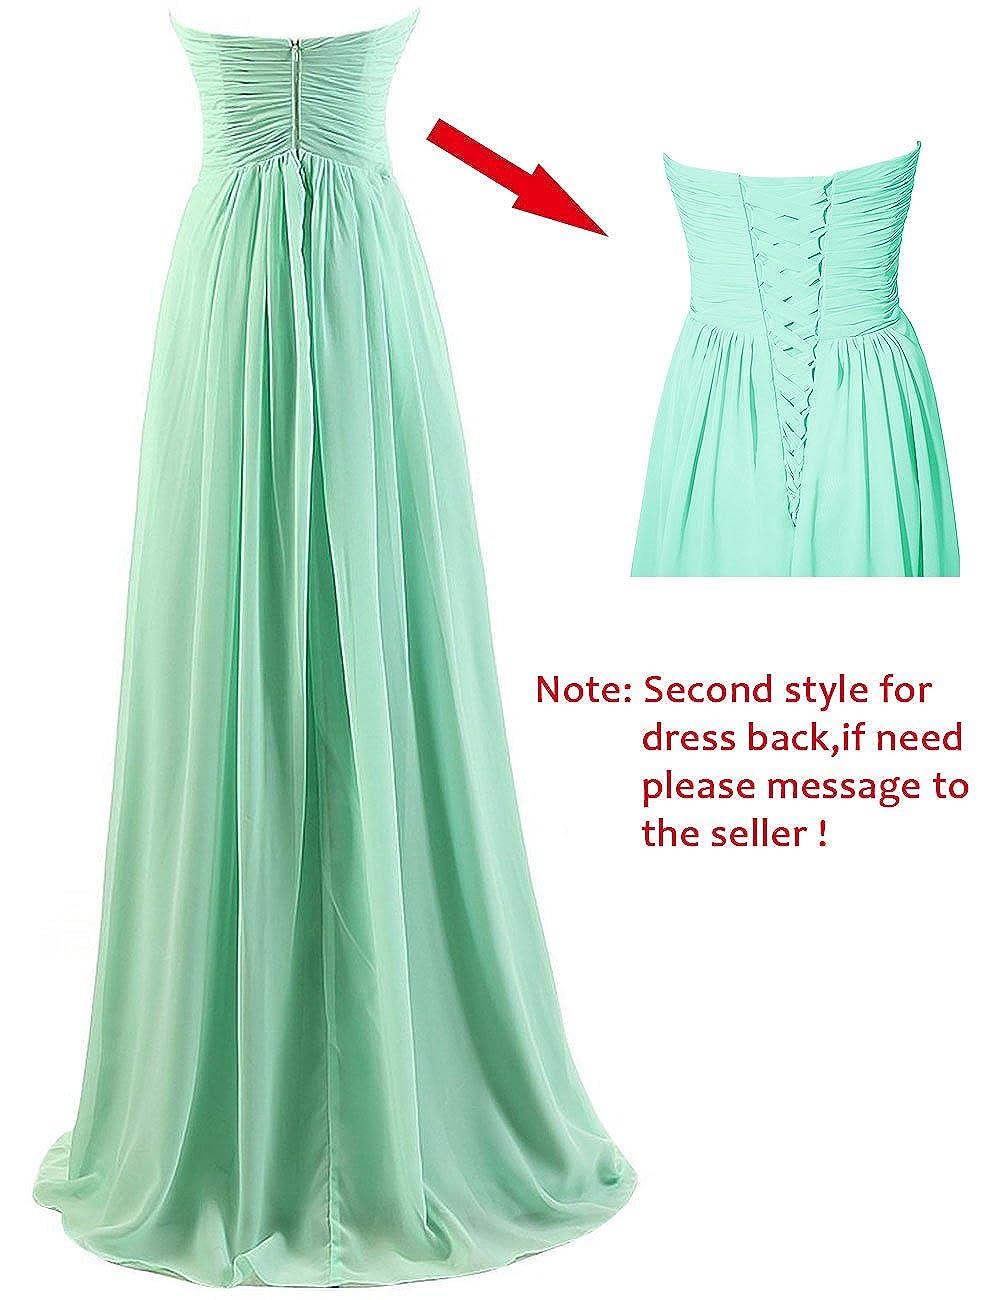 Cdress Chiffon Sweetheart Long Bridesmaid Dresses Plus Size Prom ...